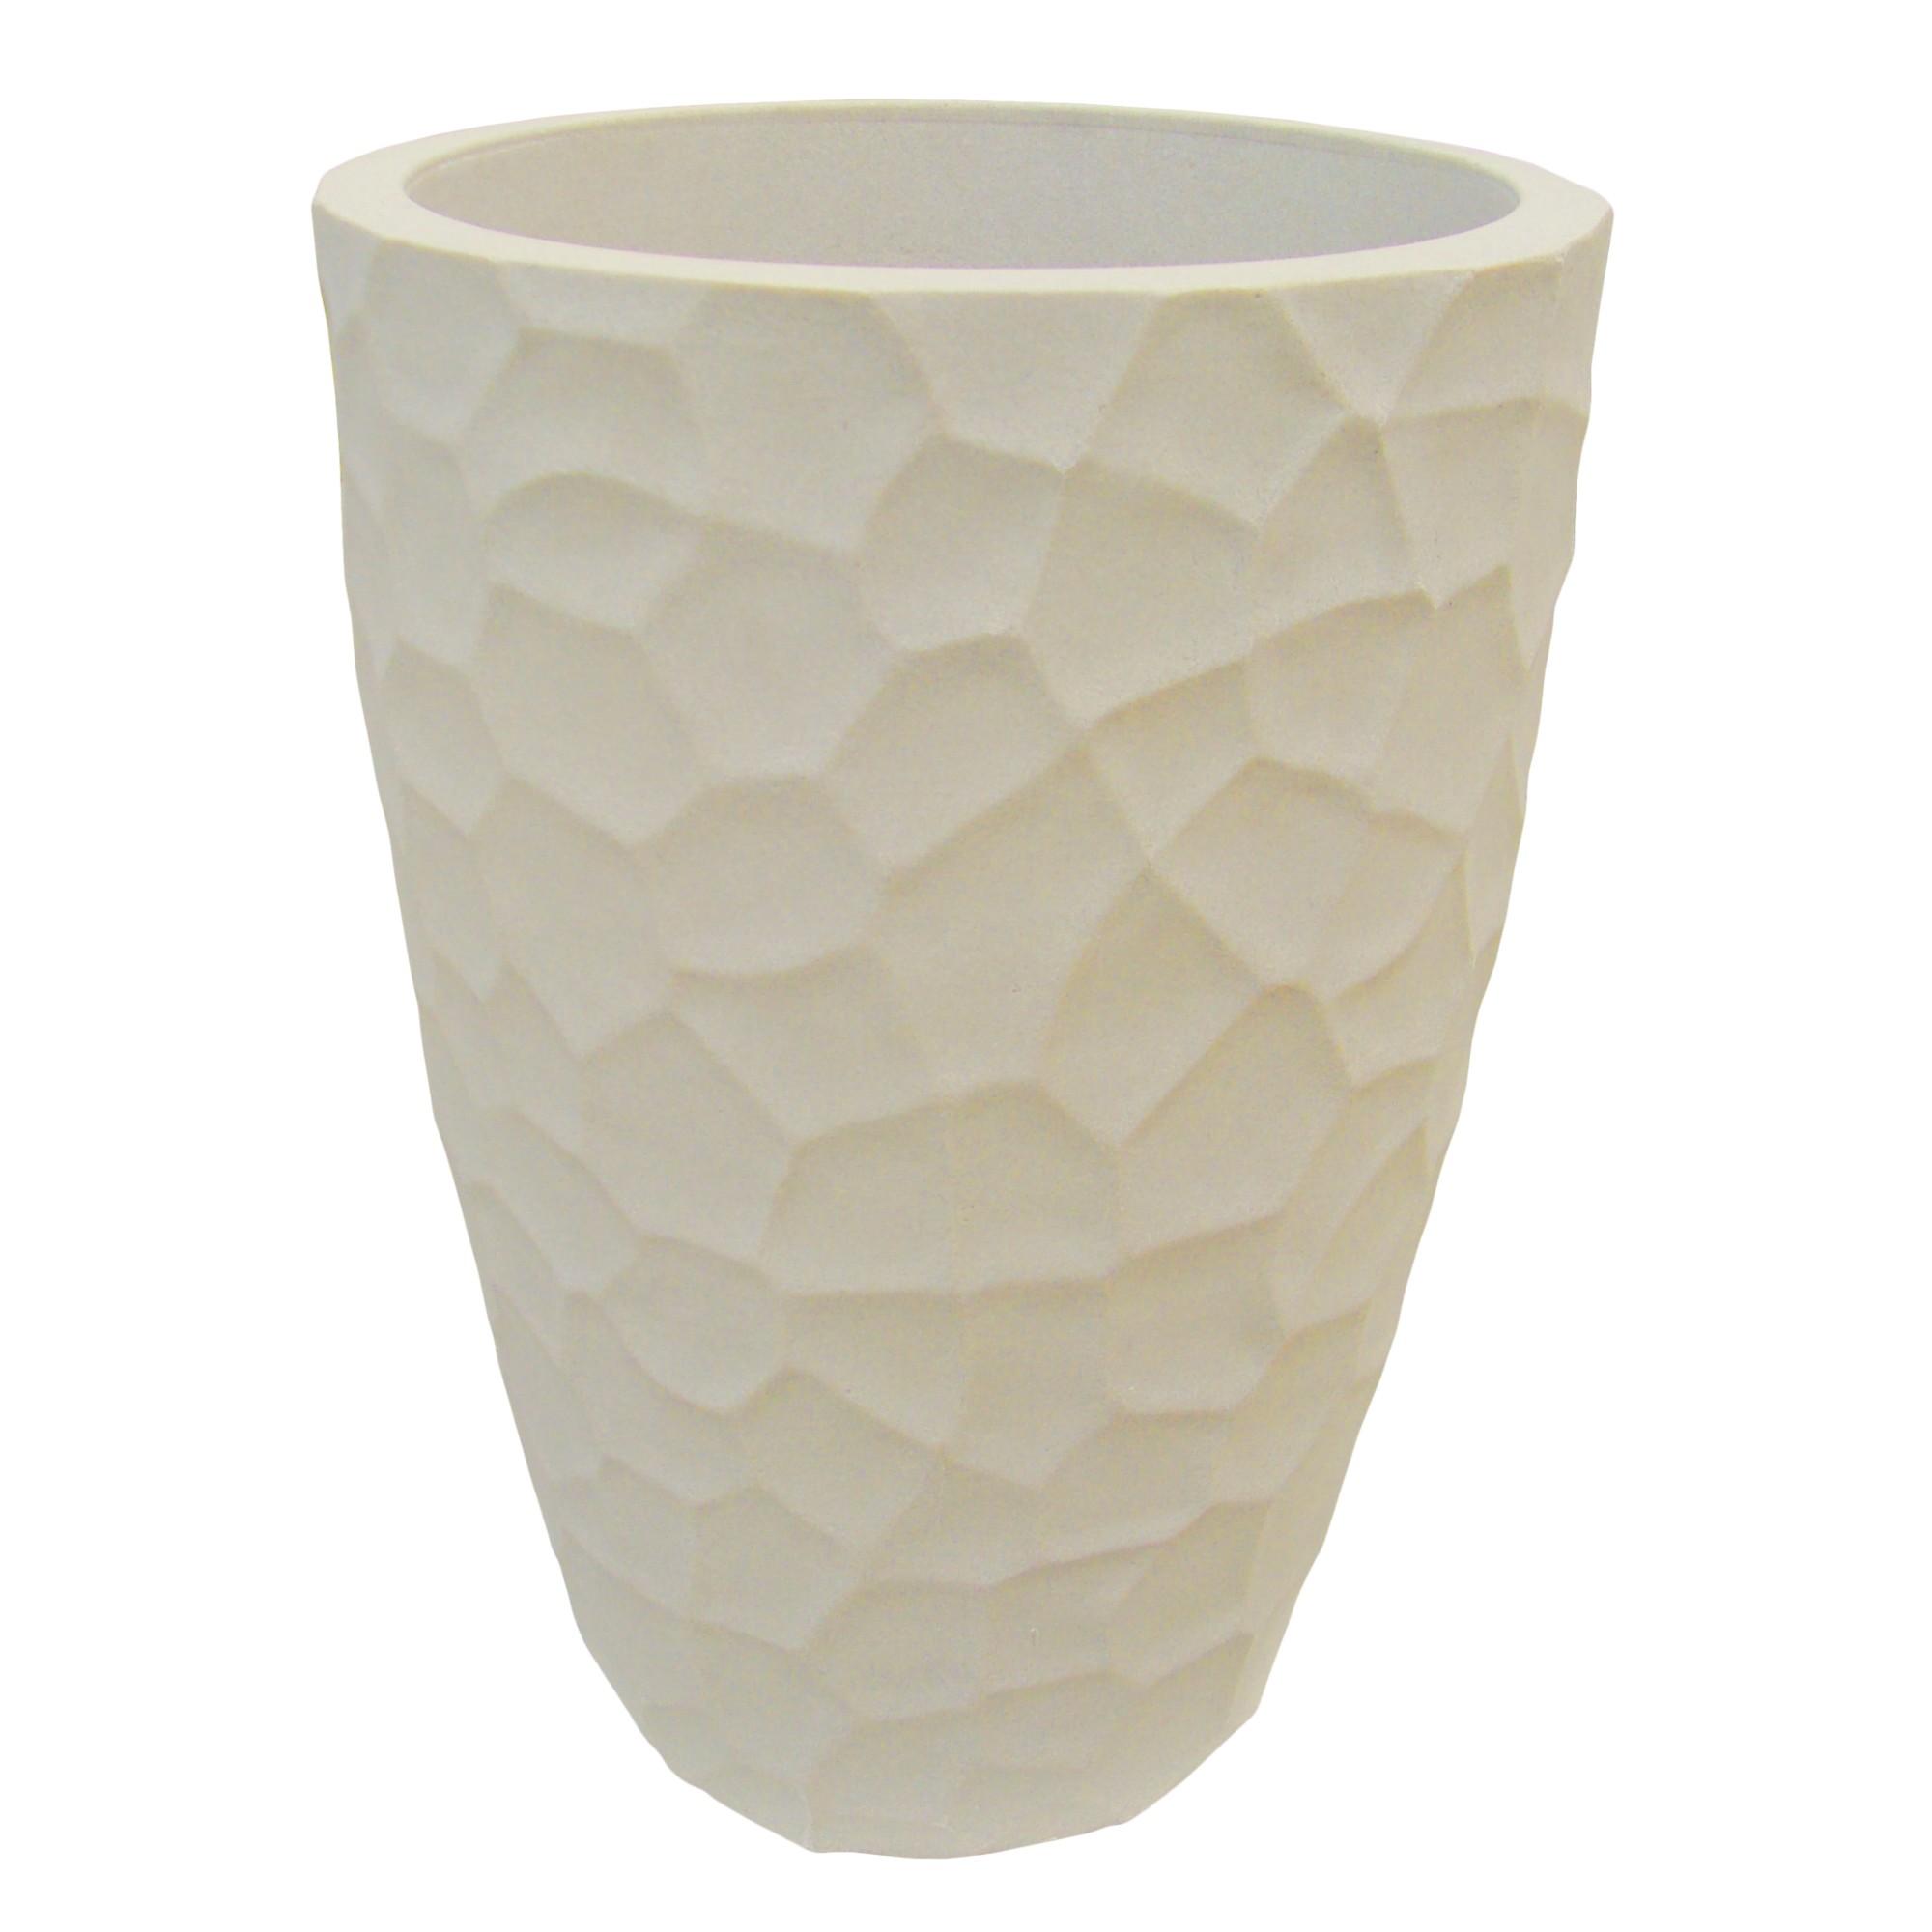 Vaso para Plantas Polietileno 59x41 cm Conico Cimento - Japi